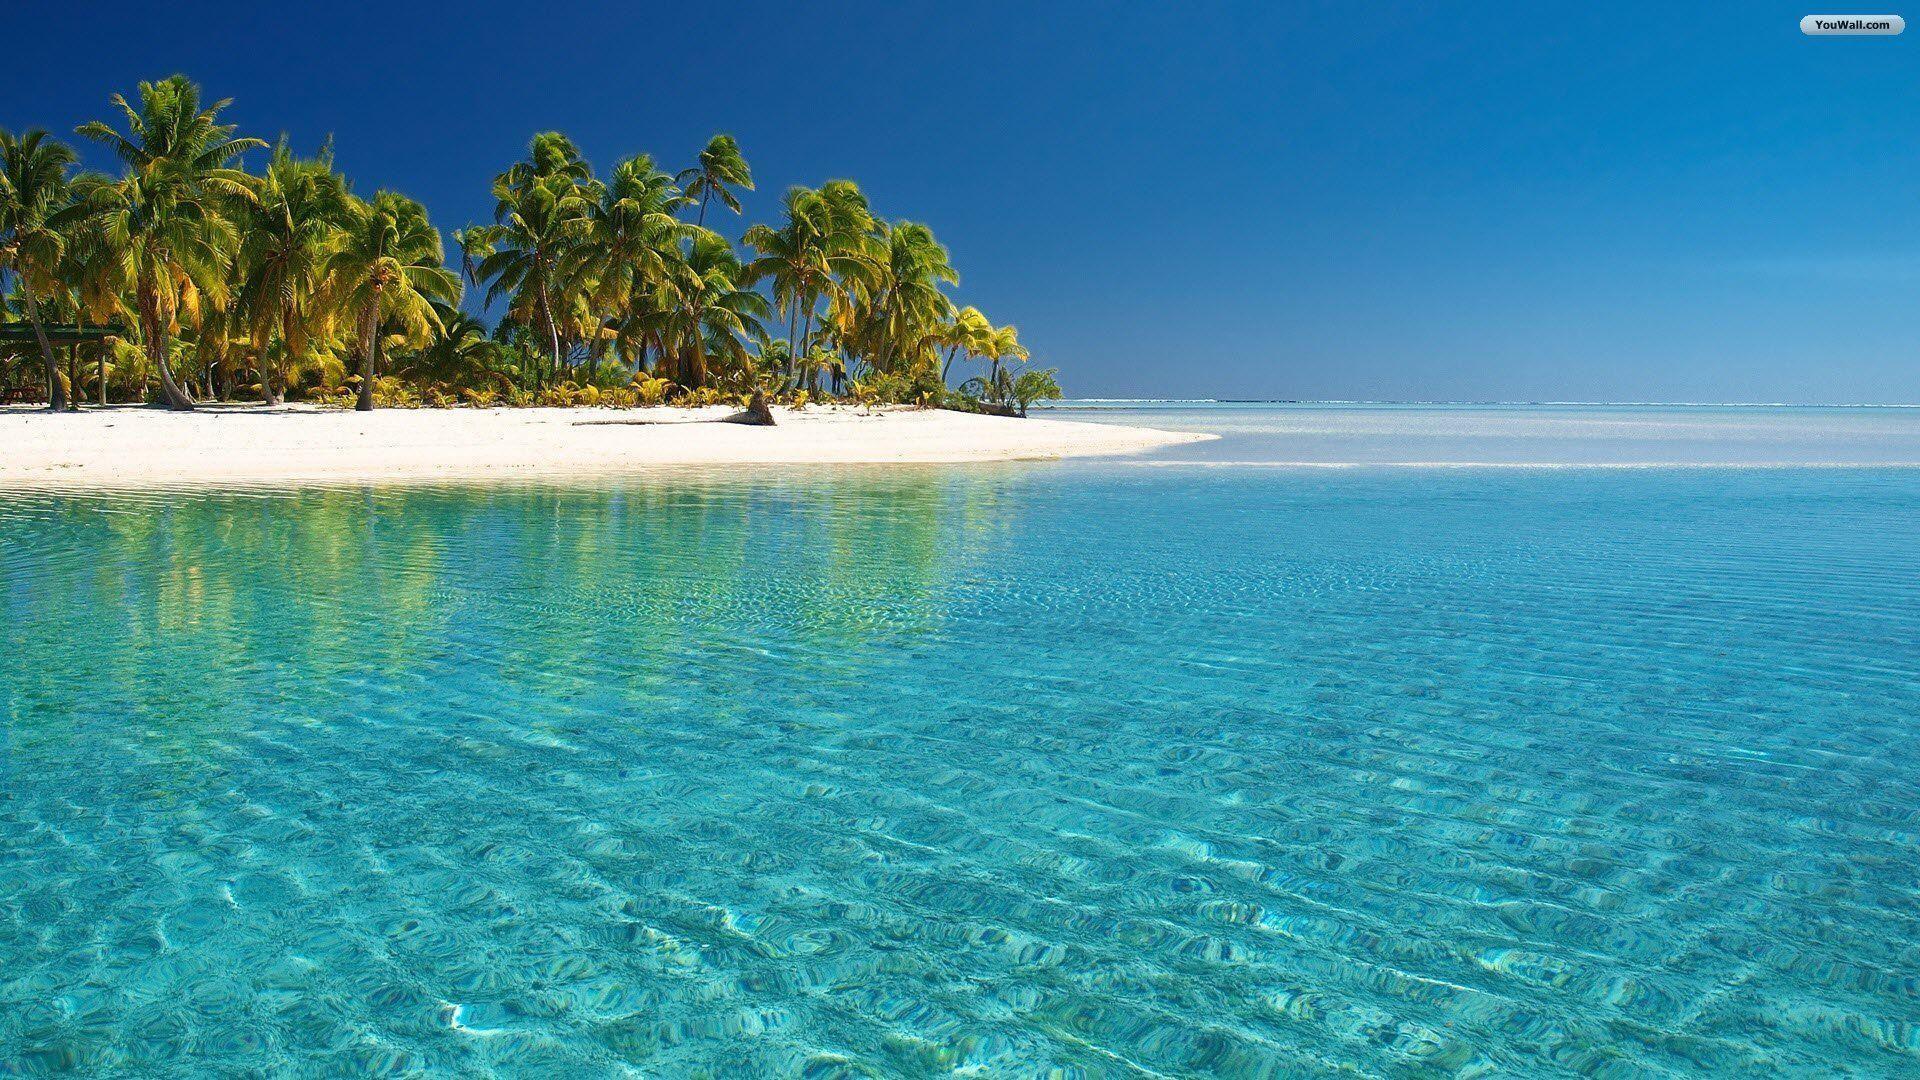 Tropical desktop backgrounds free tropical desktop wallpaper download hd wallpapers voltagebd Choice Image